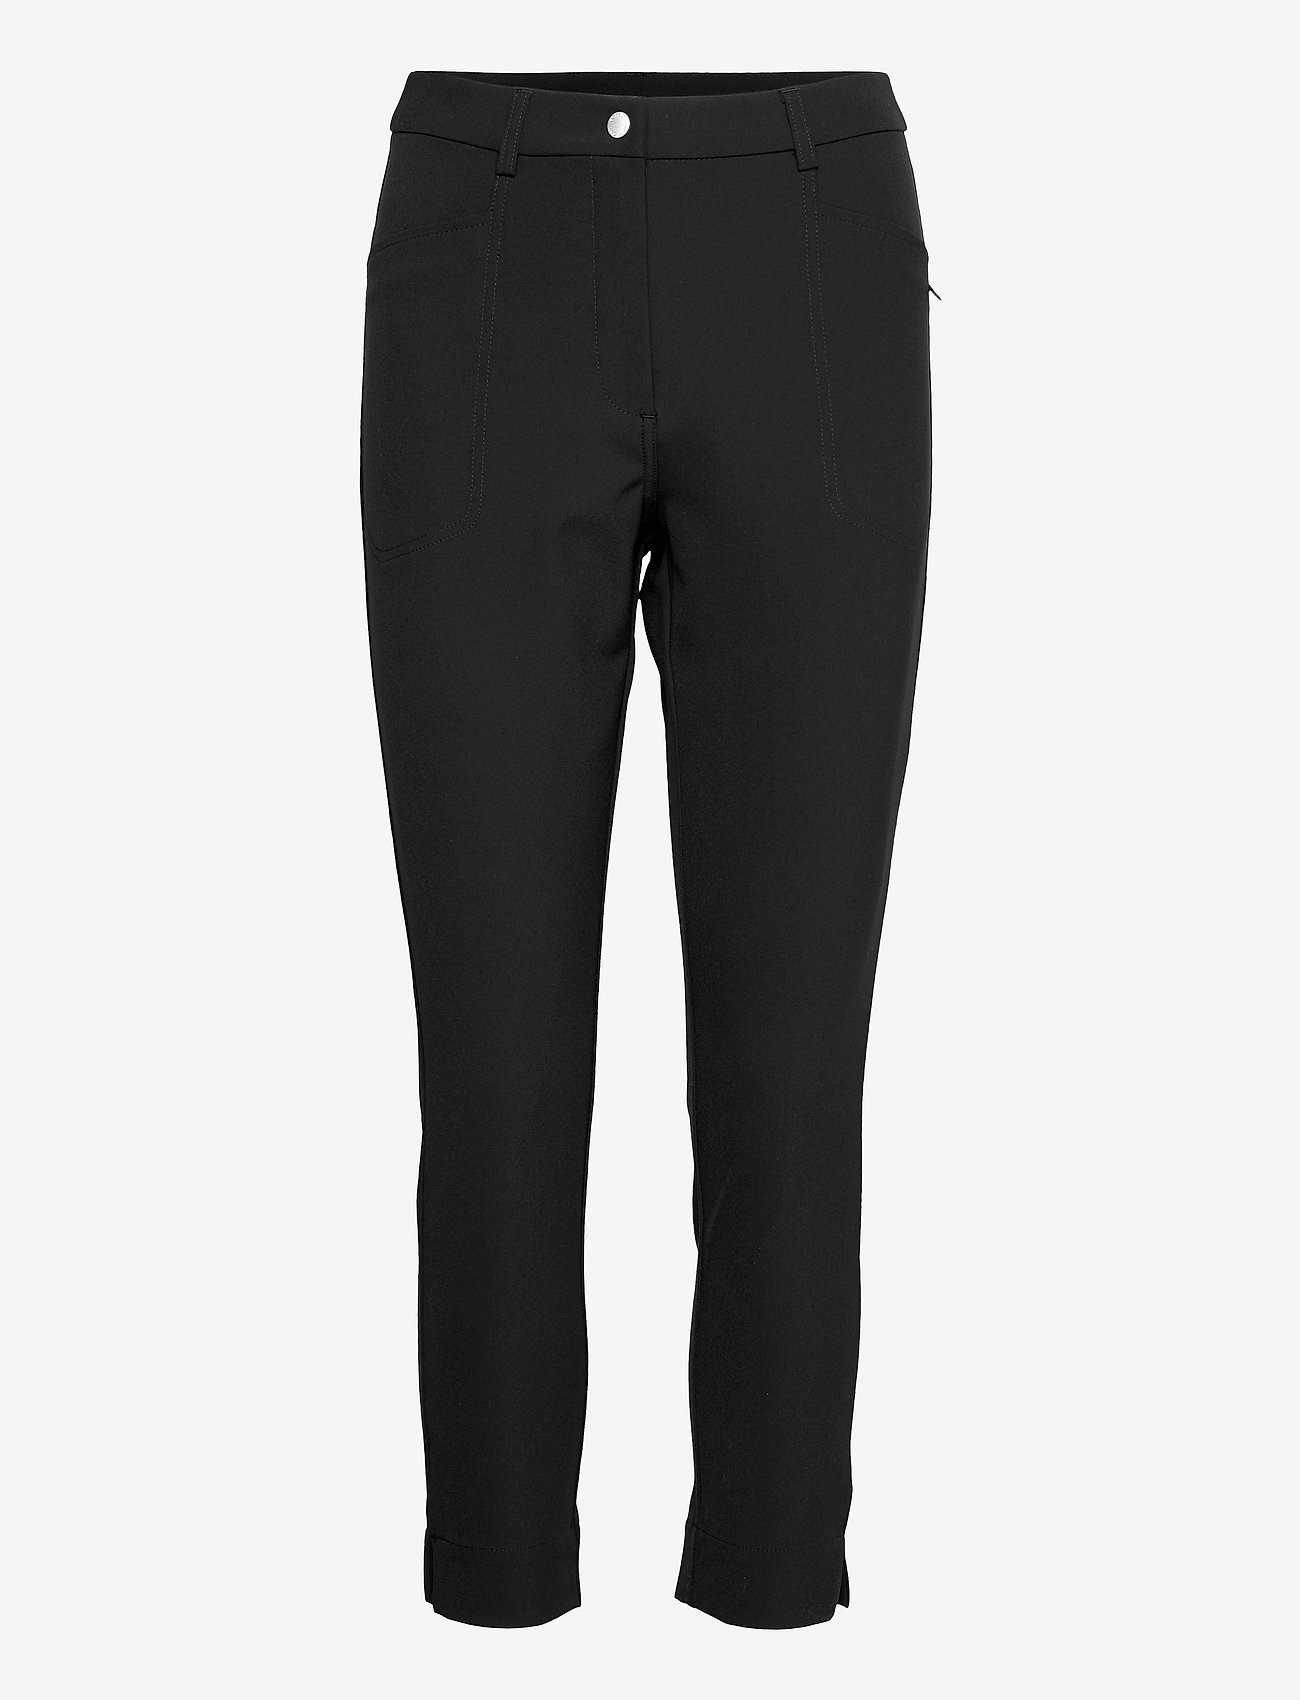 Abacus - Lds Grace high waist 7/8 trousers 92cm - golfbroeken - black - 0